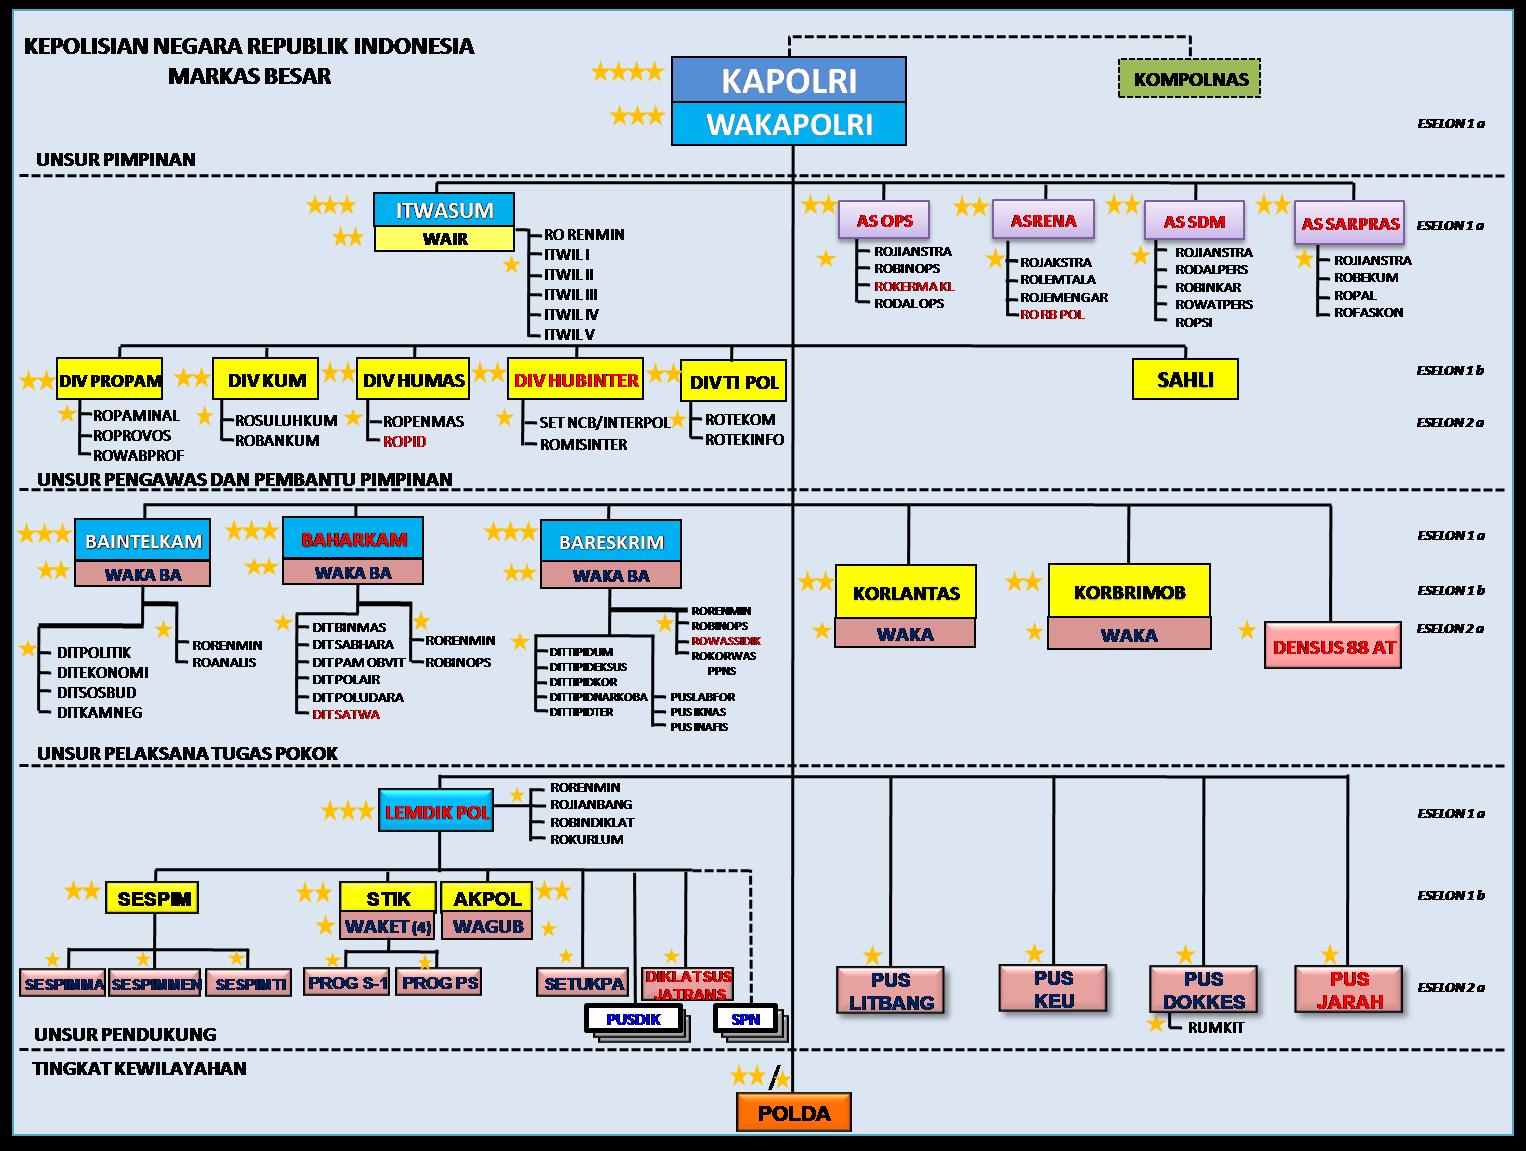 Struktur Organisasi Di Kepolisian Indonesia Mabes Polda